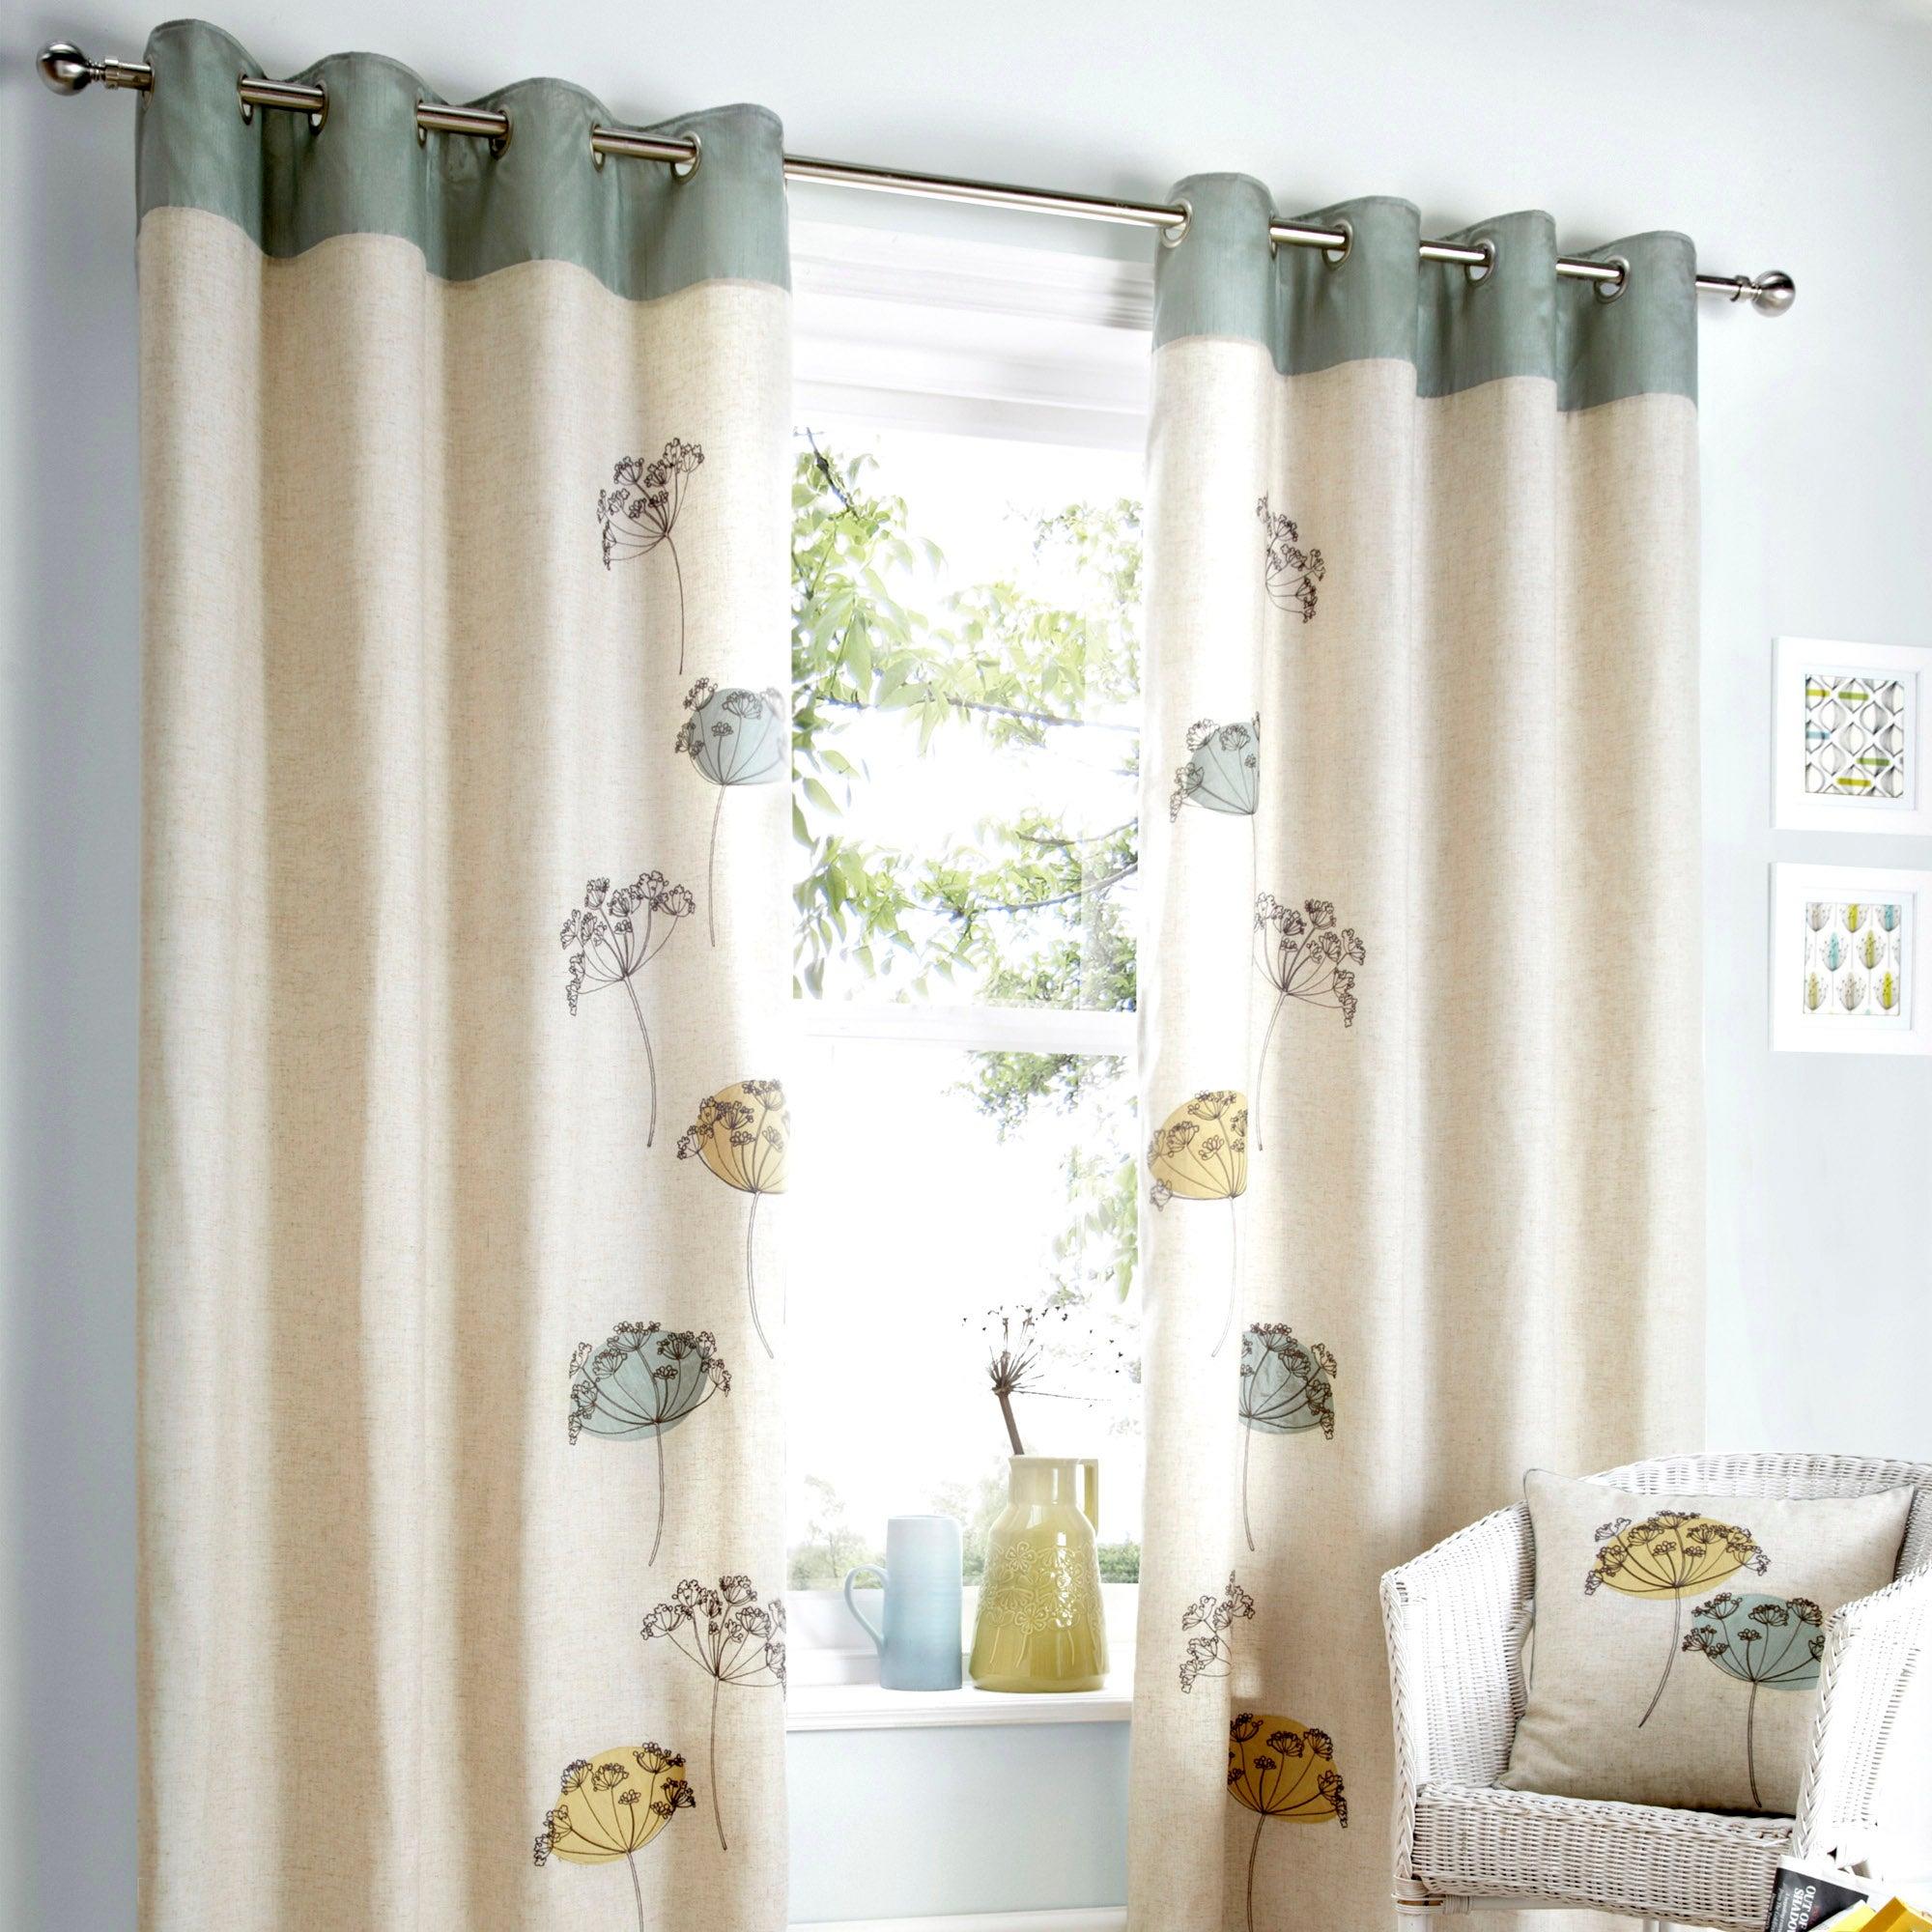 Natural Carmela Lined Eyelet Curtains